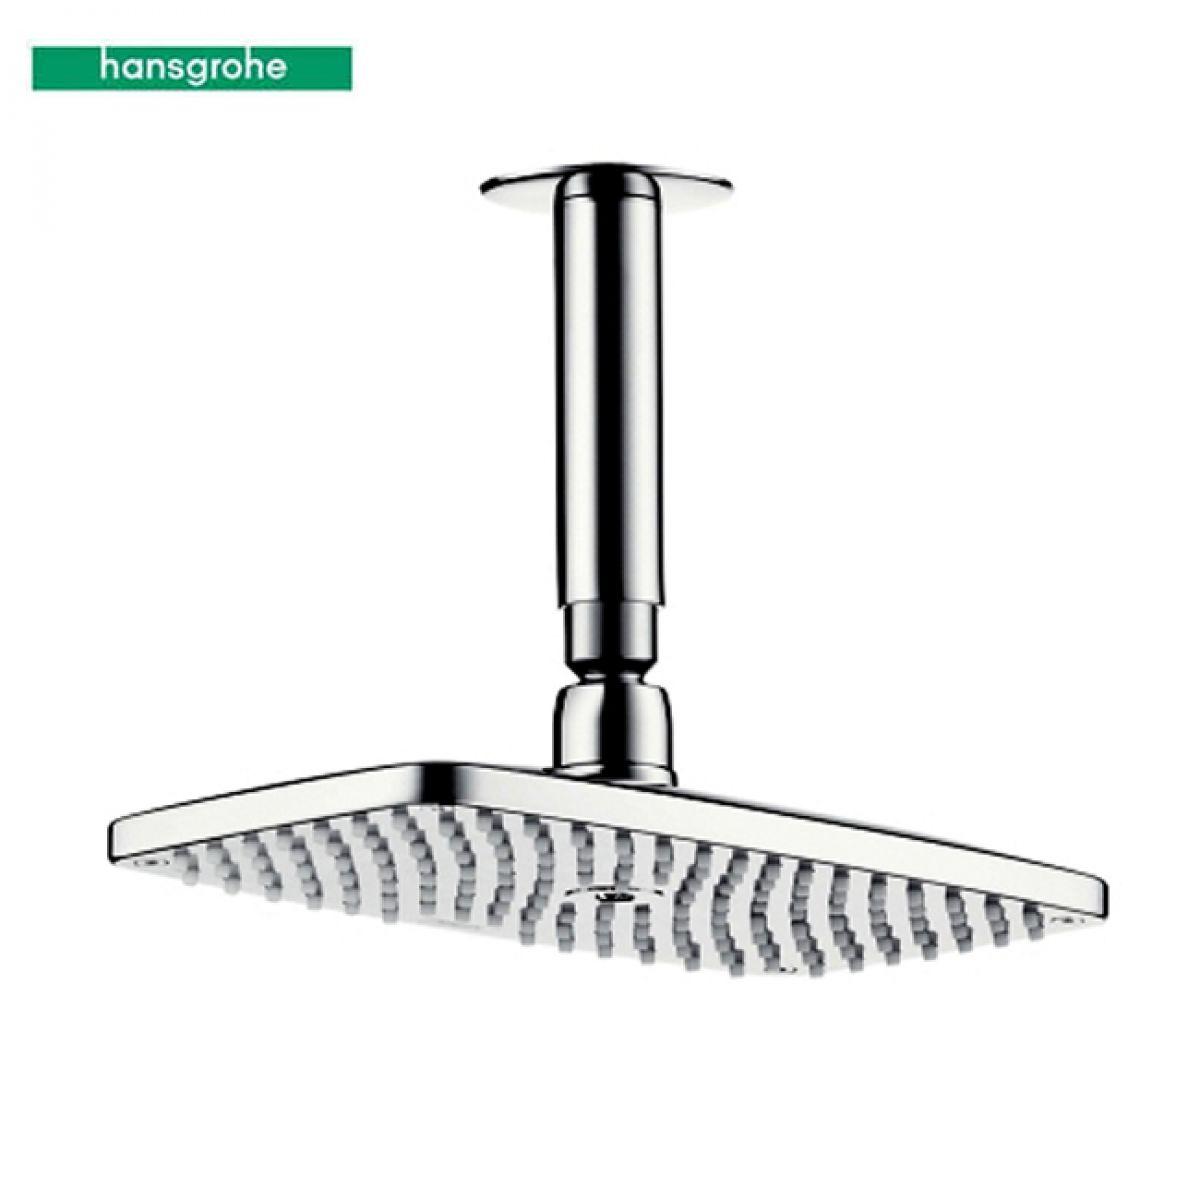 Hansgrohe Raindance E Overhead Shower with 100mm Arm : UK Bathrooms